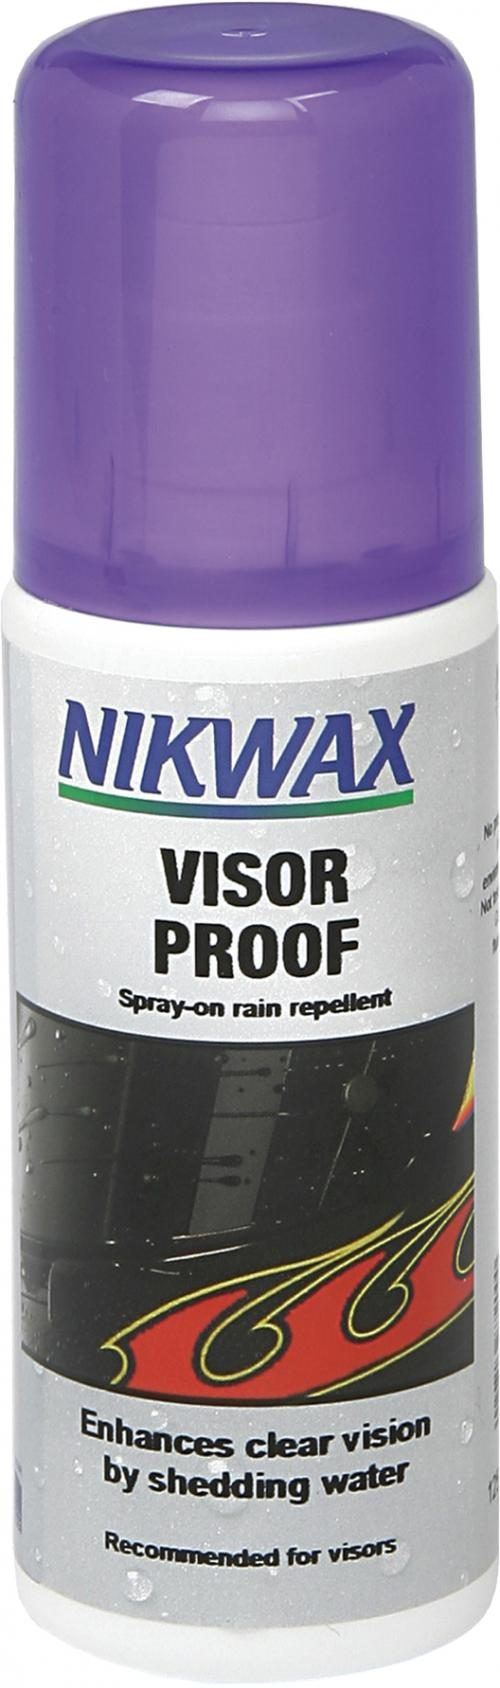 Rain Repellent 125 ML spray-on